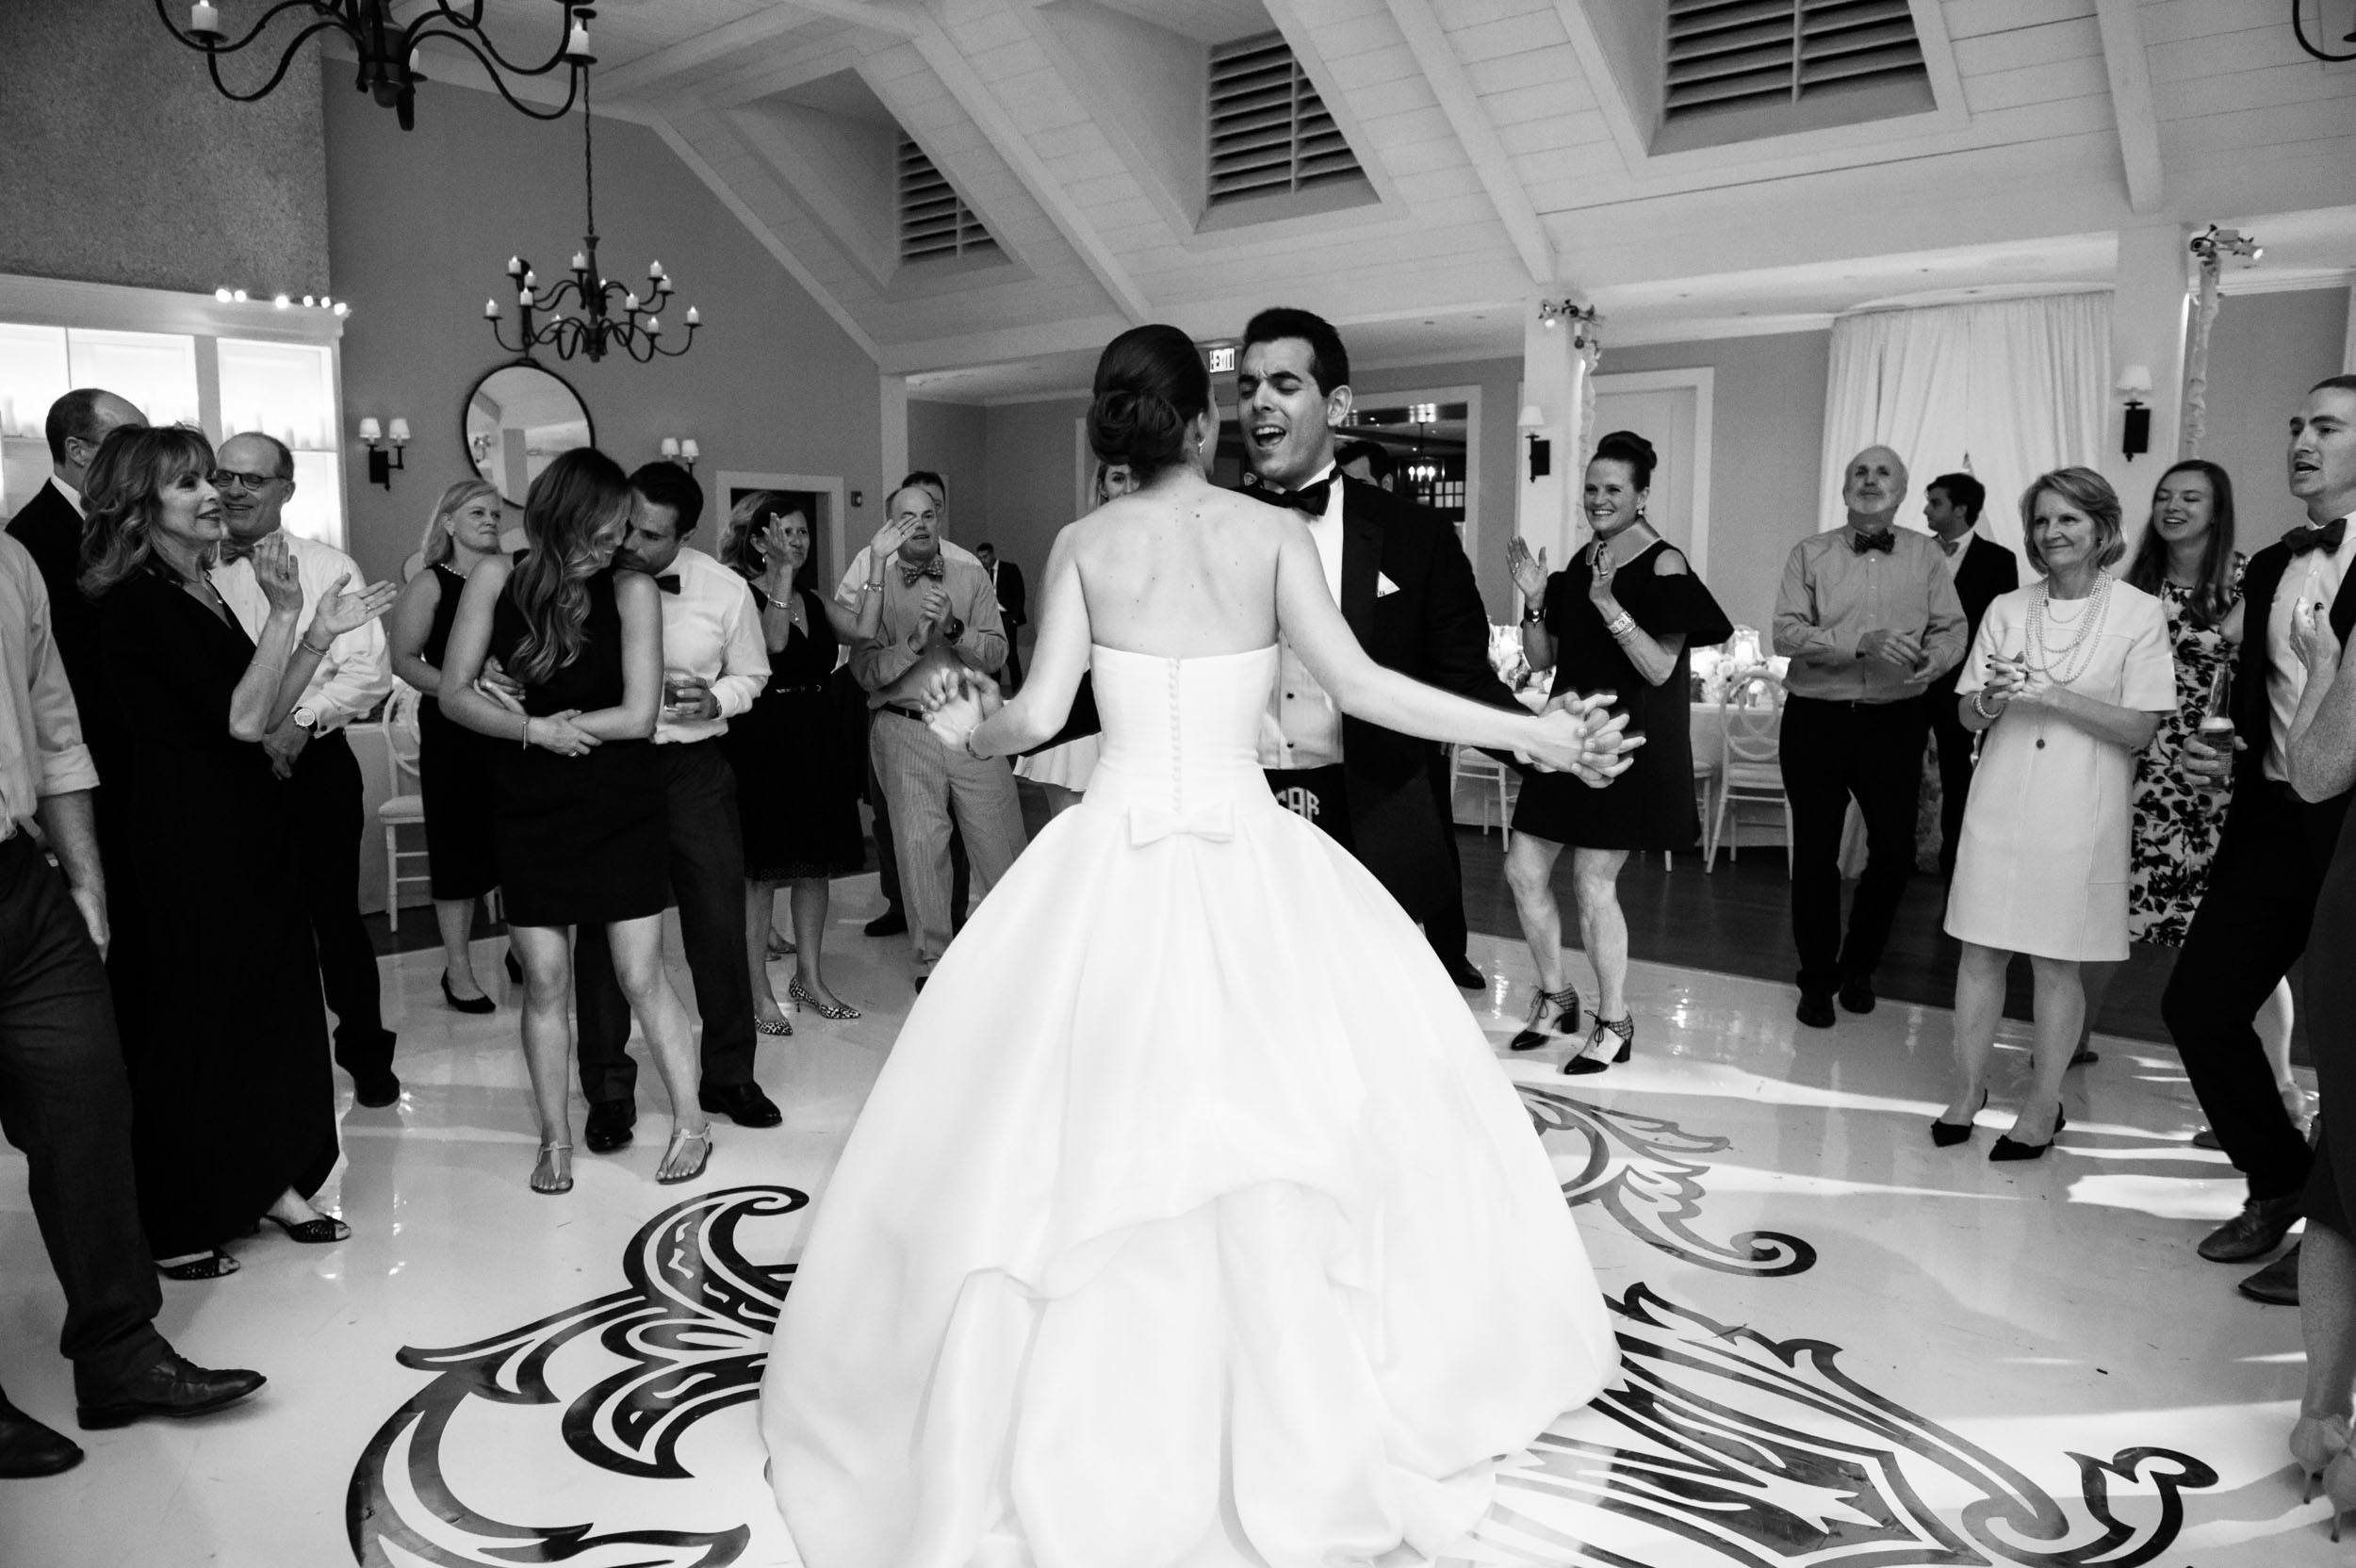 Bride and groom dance at their wedding in Kiawah Island, SC